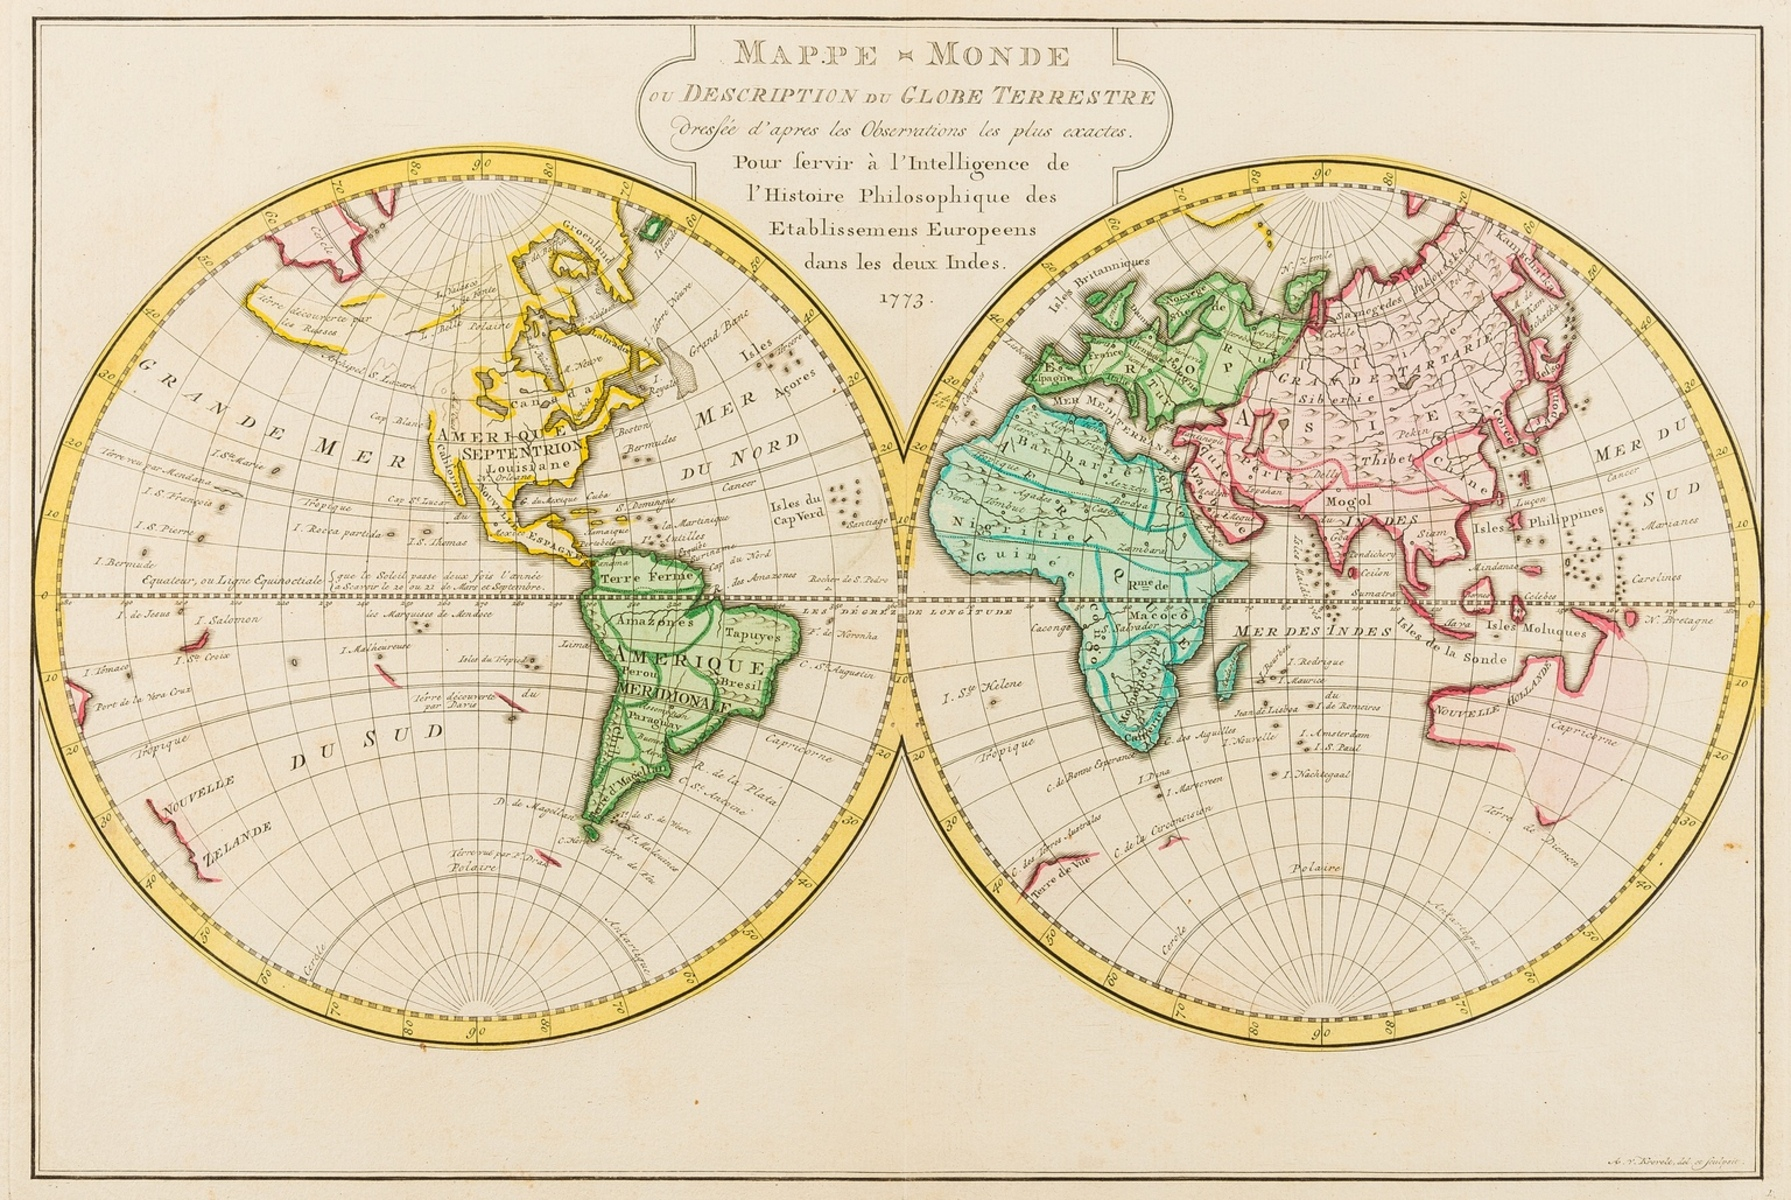 World.- Krevelt (A. van) Mappe-Monde ou Description du Globe Terrestre..., 1773.